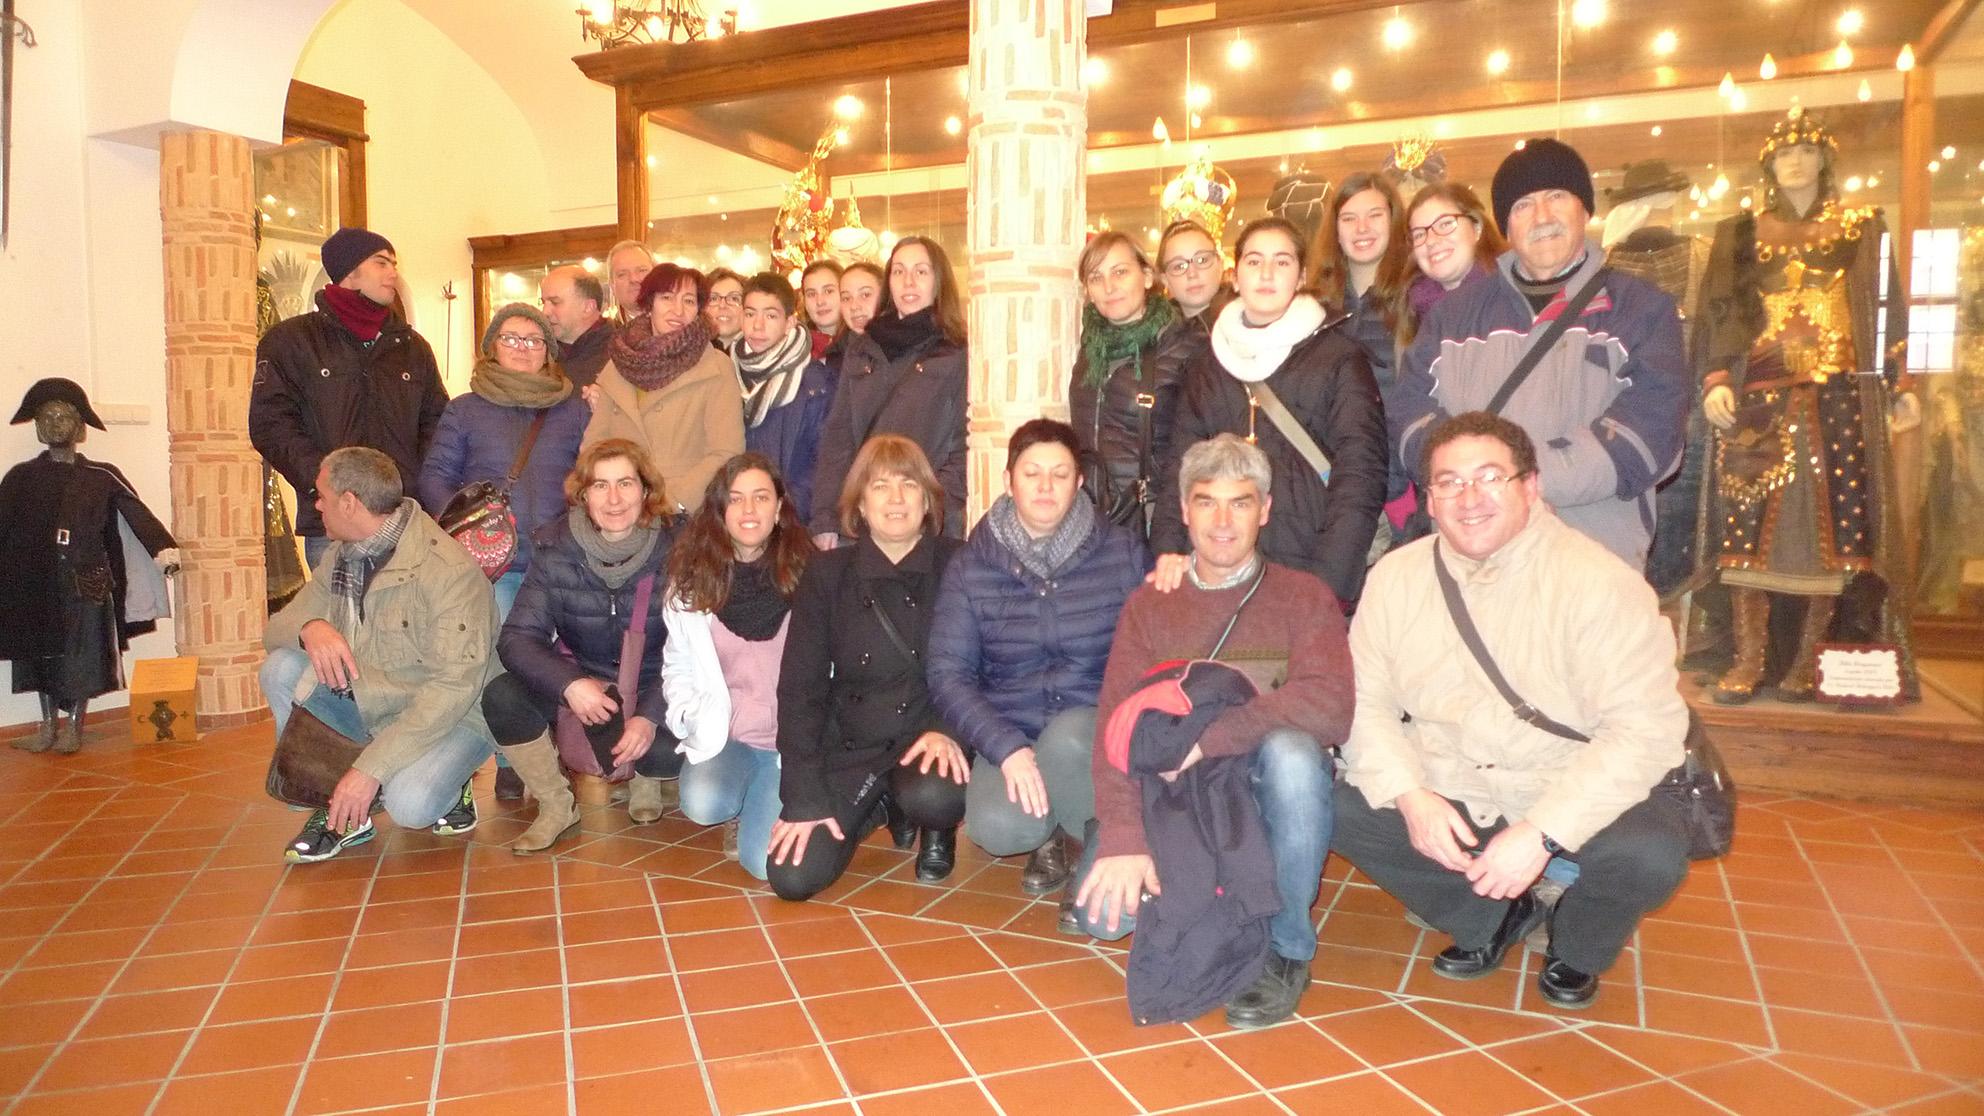 2015-01-17i18 Fireta St. Antoni MURO 2015 (3)